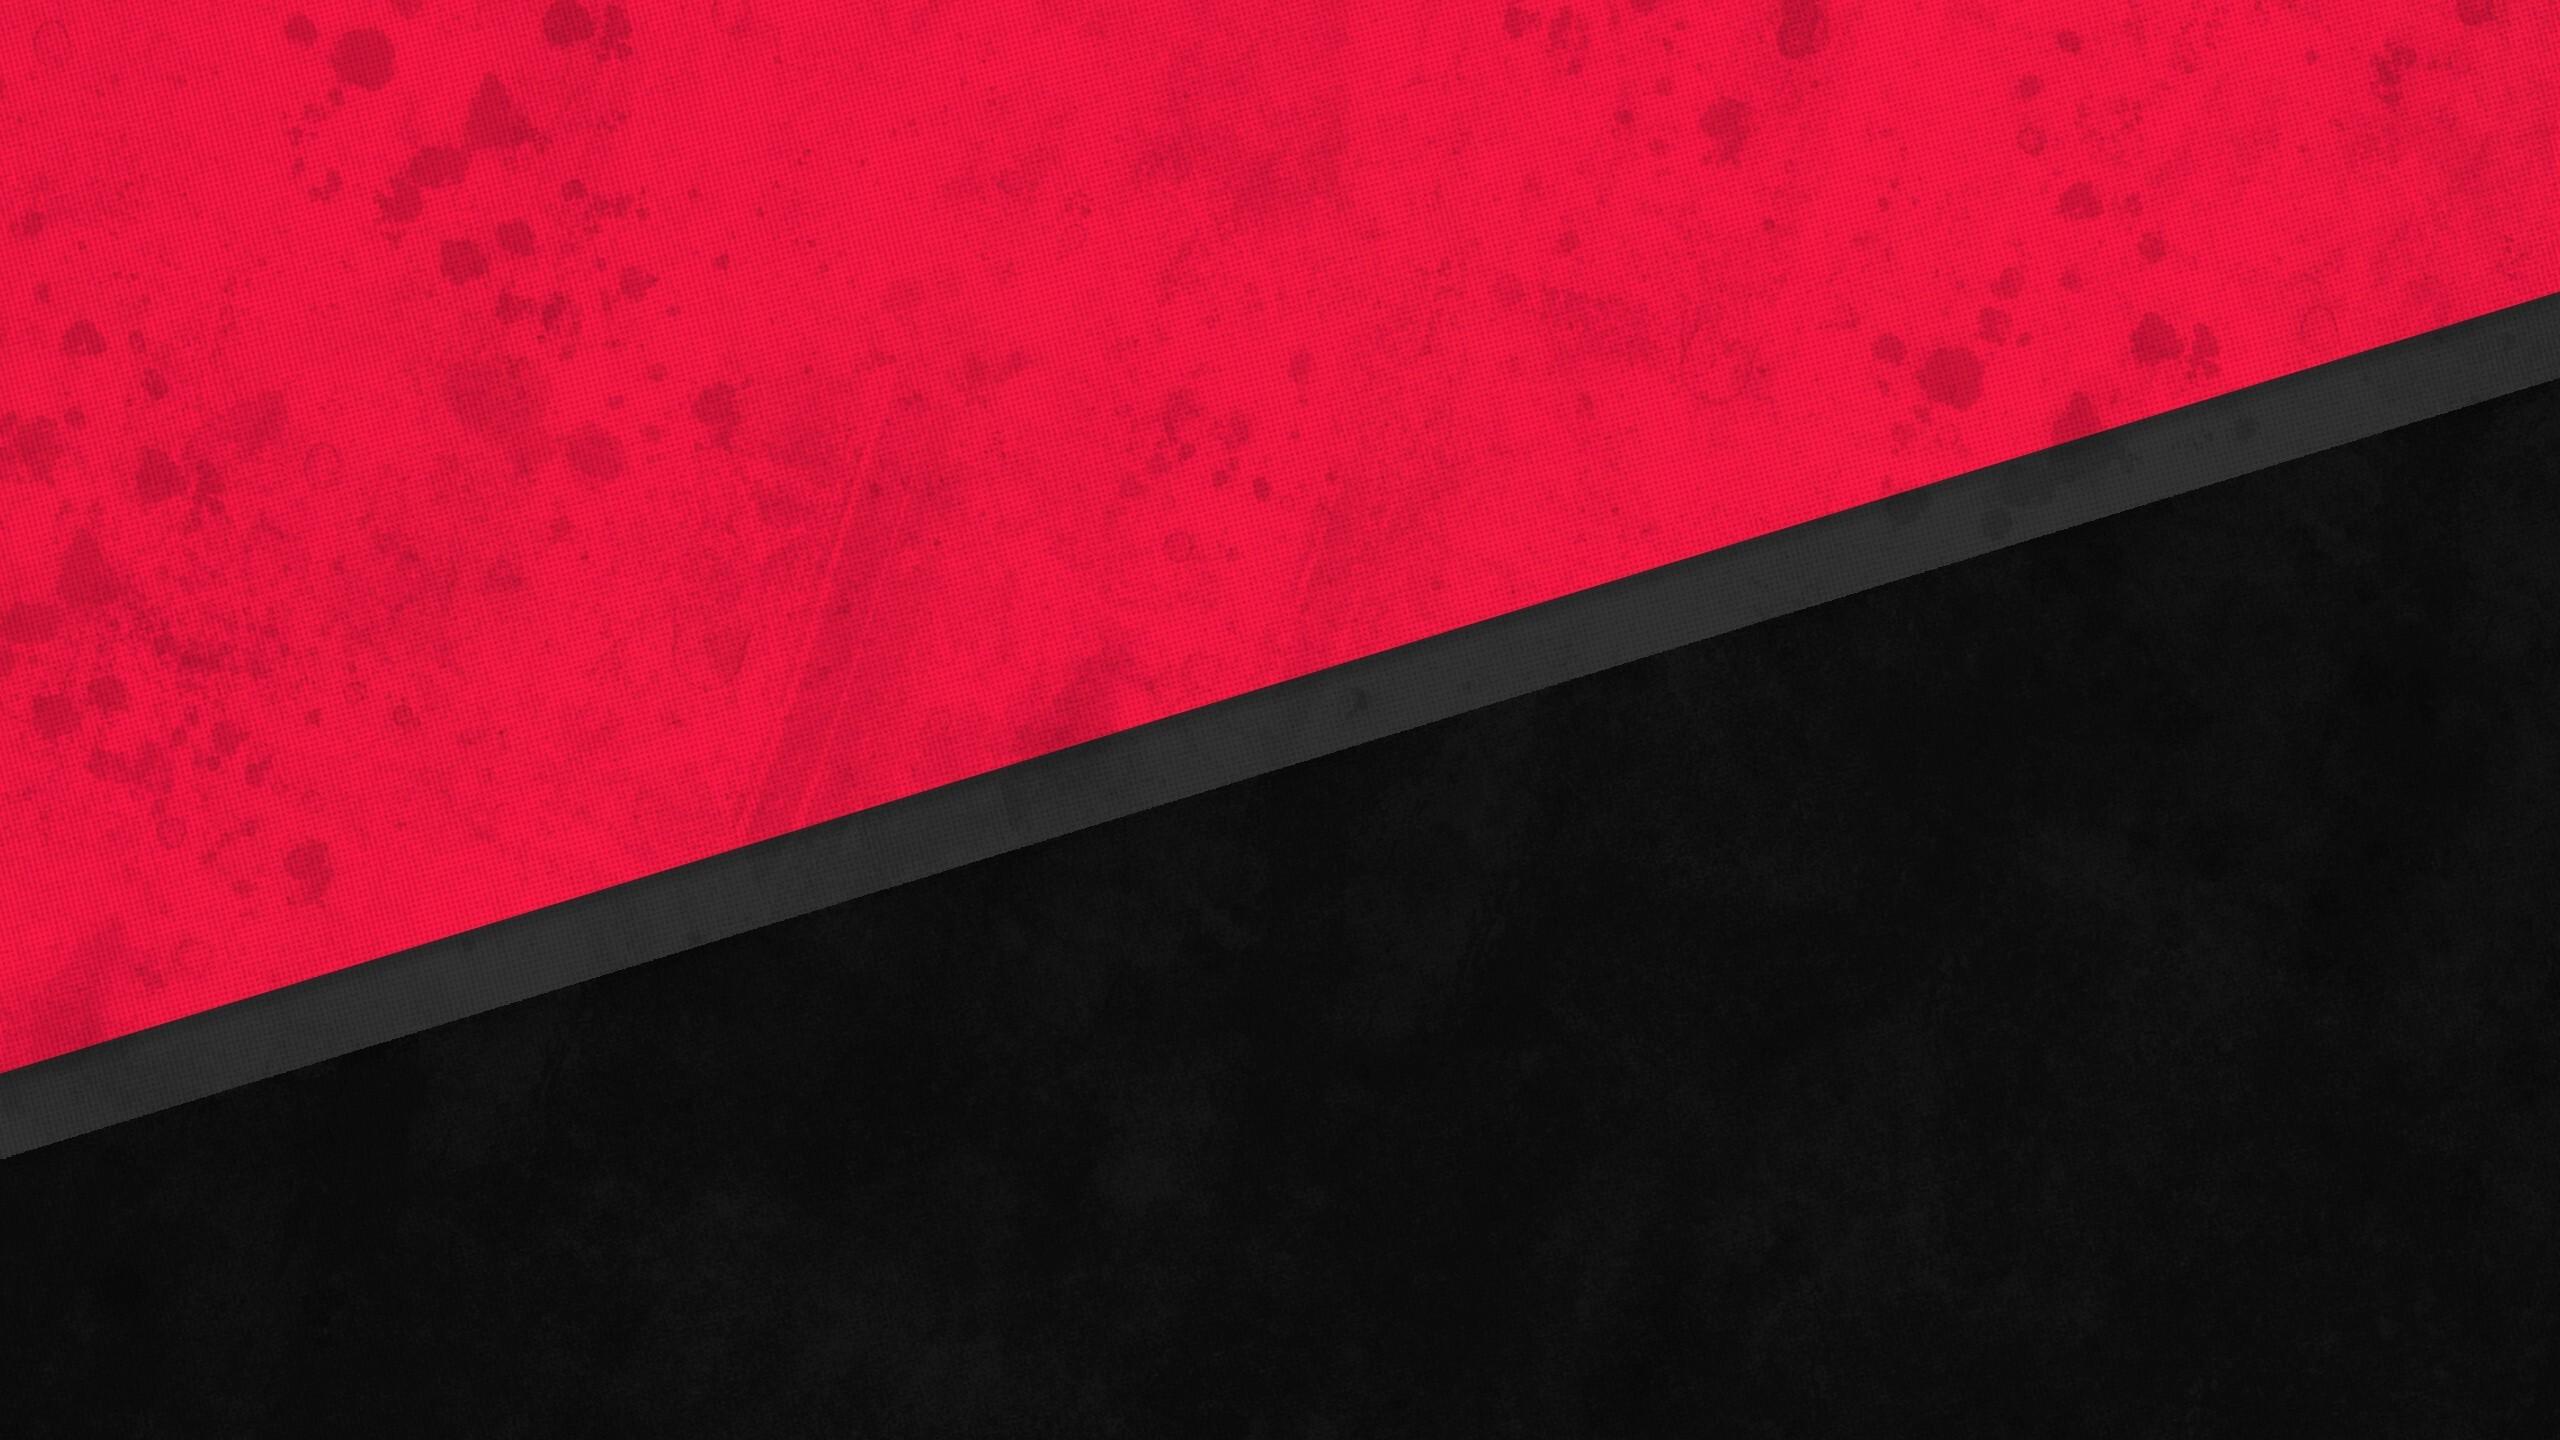 2560x1440 Red Black Texture 1440P Resolution HD 4k ...